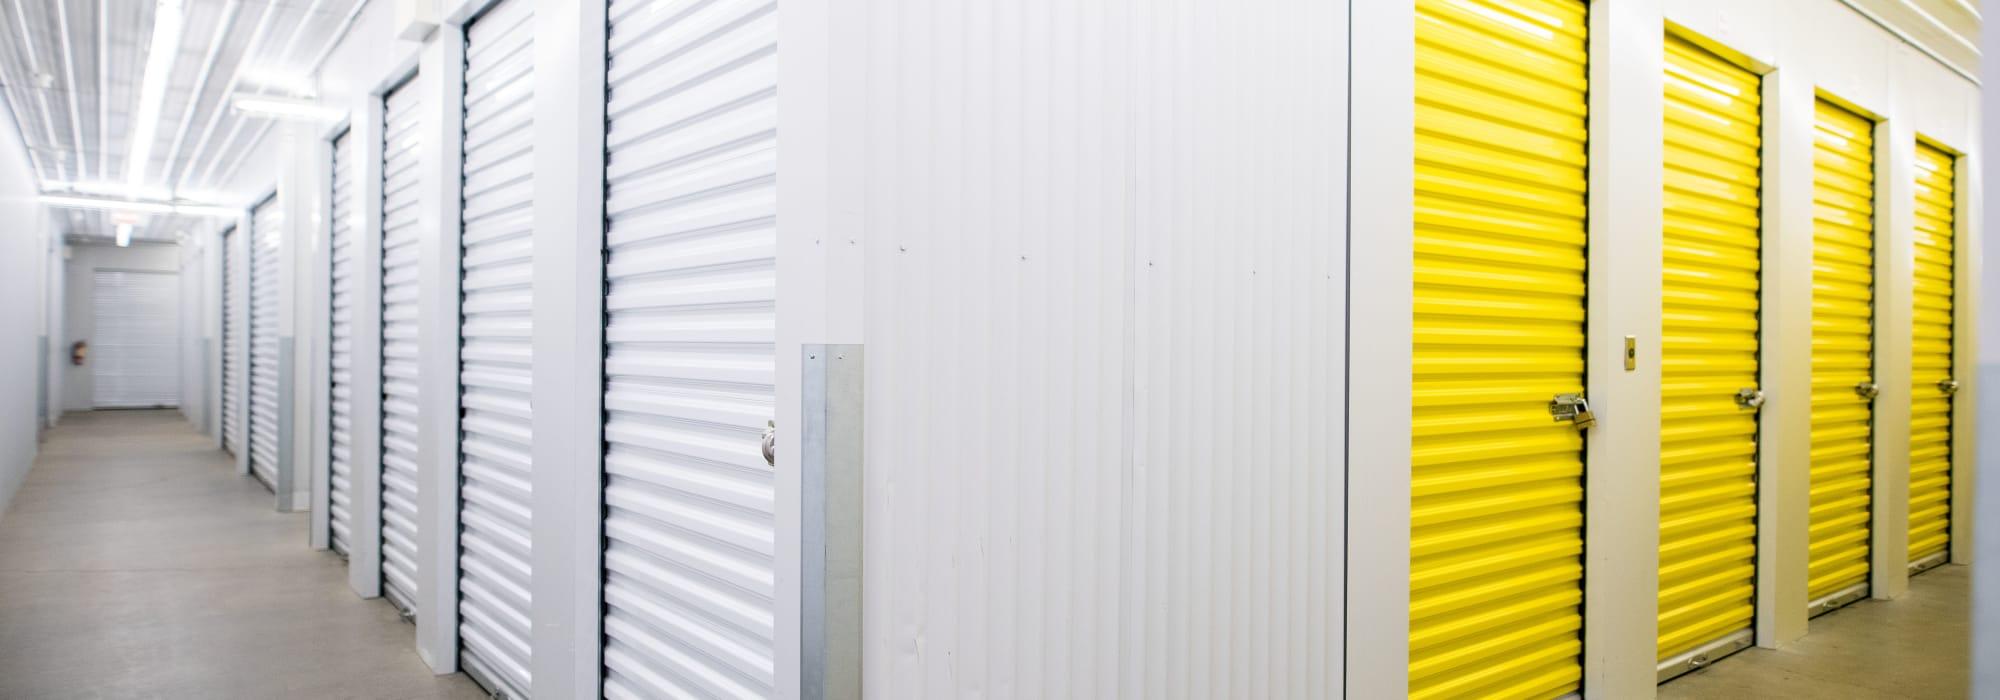 White and yellow unit doors at Apple Self Storage - Waterloo in Waterloo, Ontario